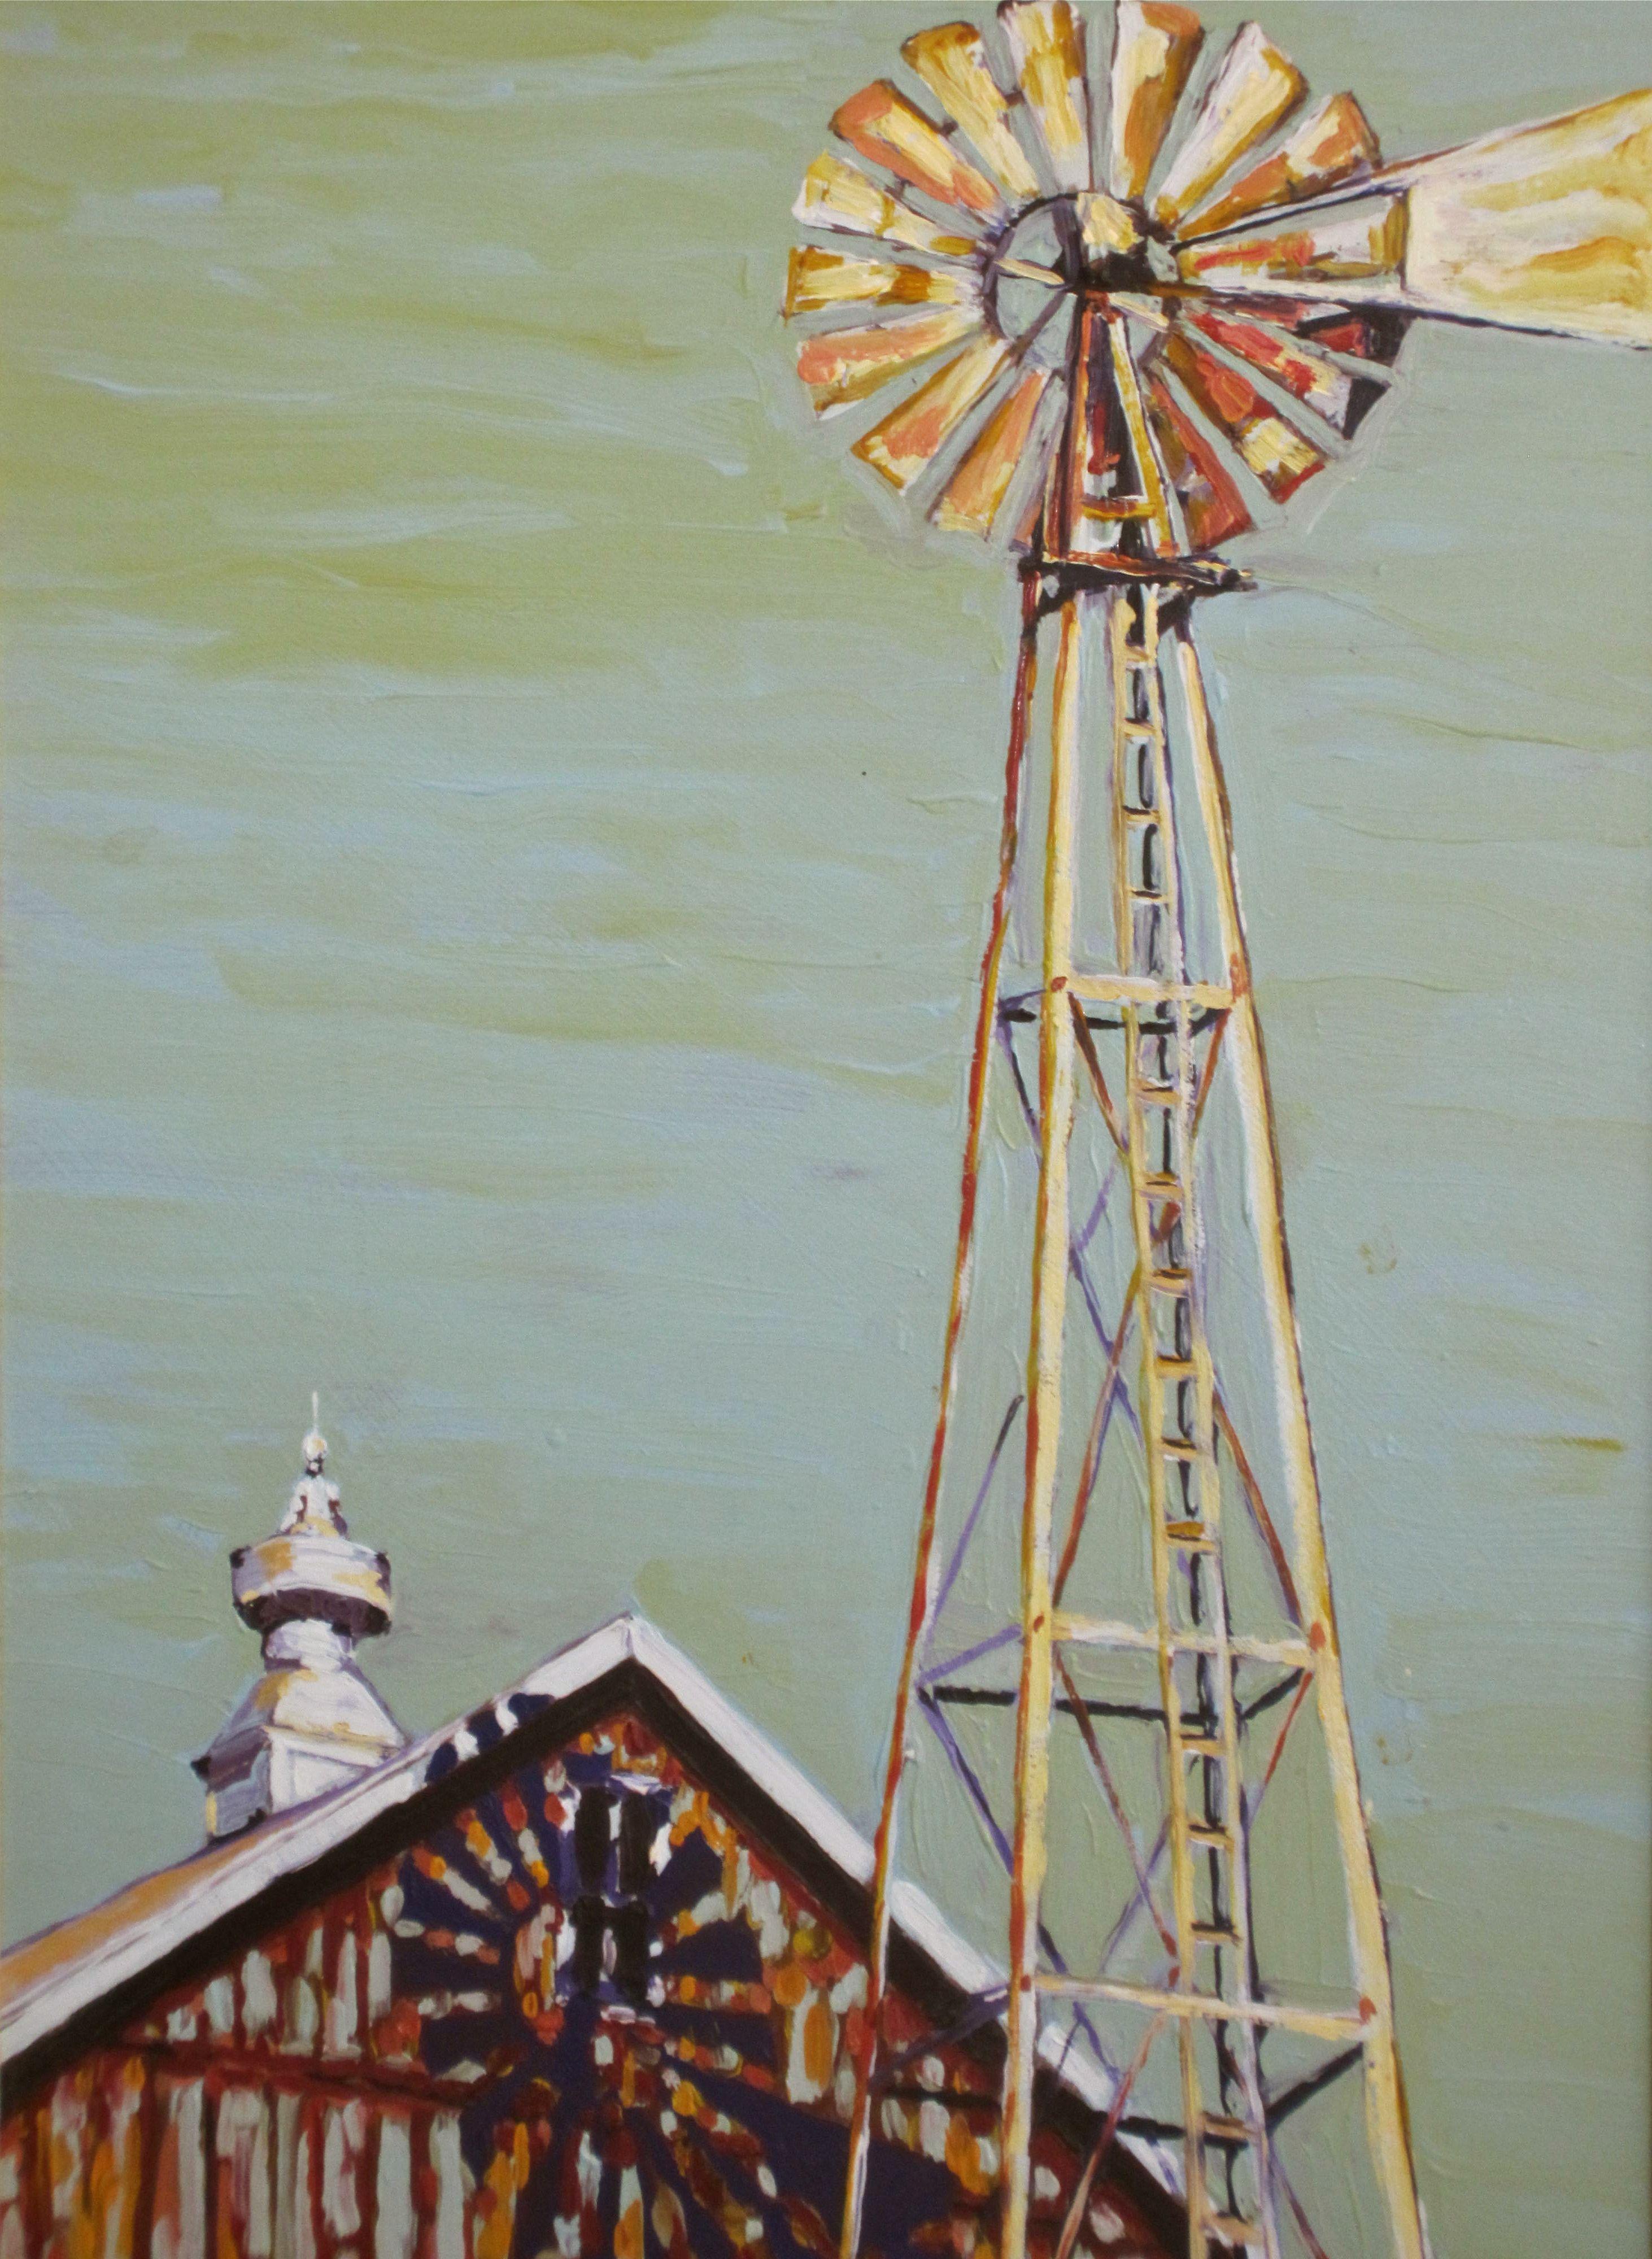 Minnesota Barn and Windmill by Nancy Stark